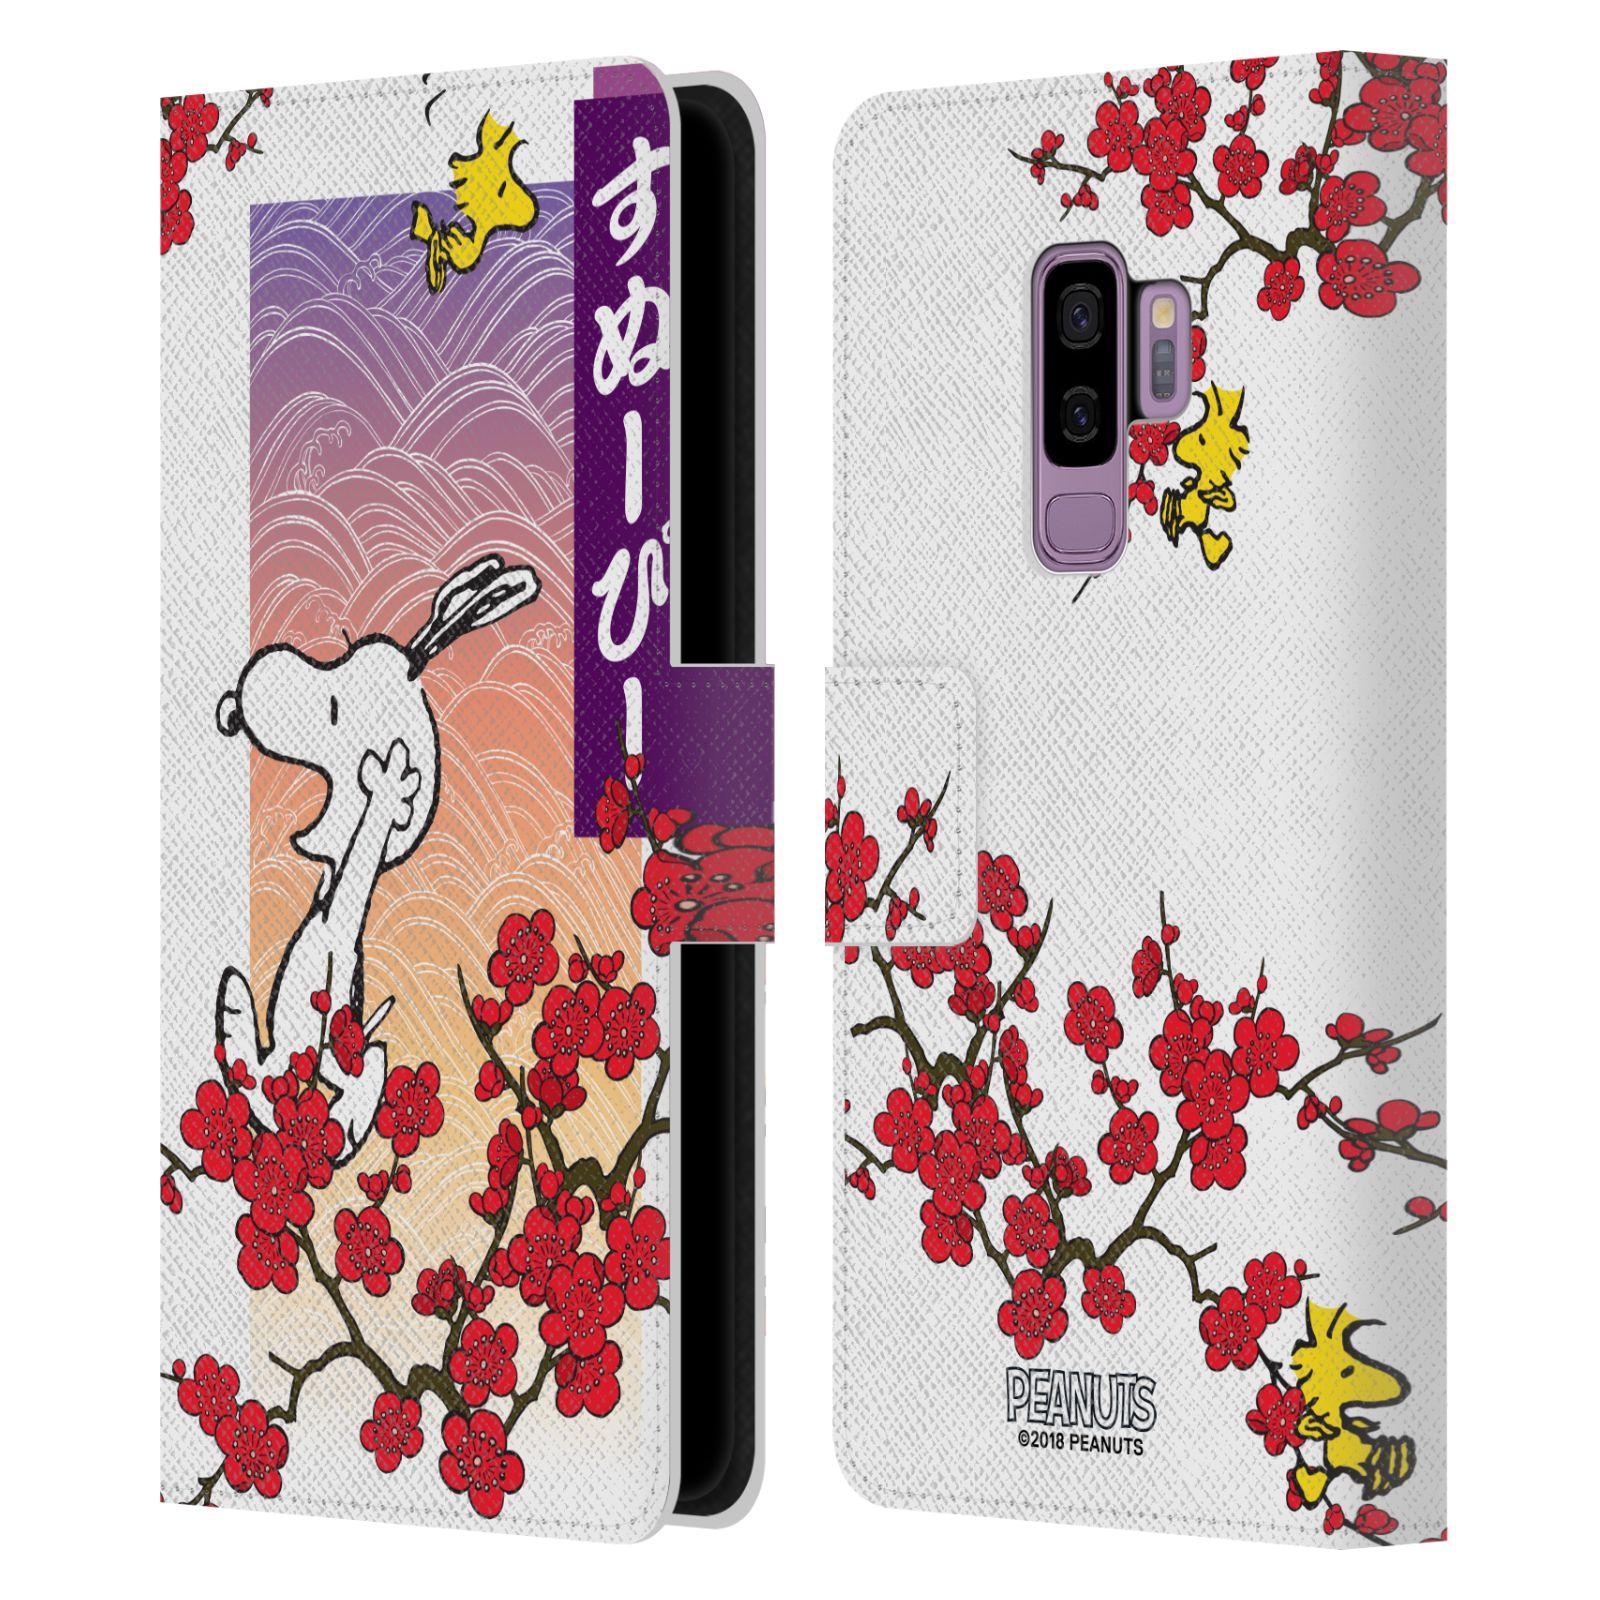 Pouzdro na mobil Samsung Galaxy S9 Plus - Head Case - Peanuts - Snoopy, ptáček Woodstock rozkvetlá třešeň